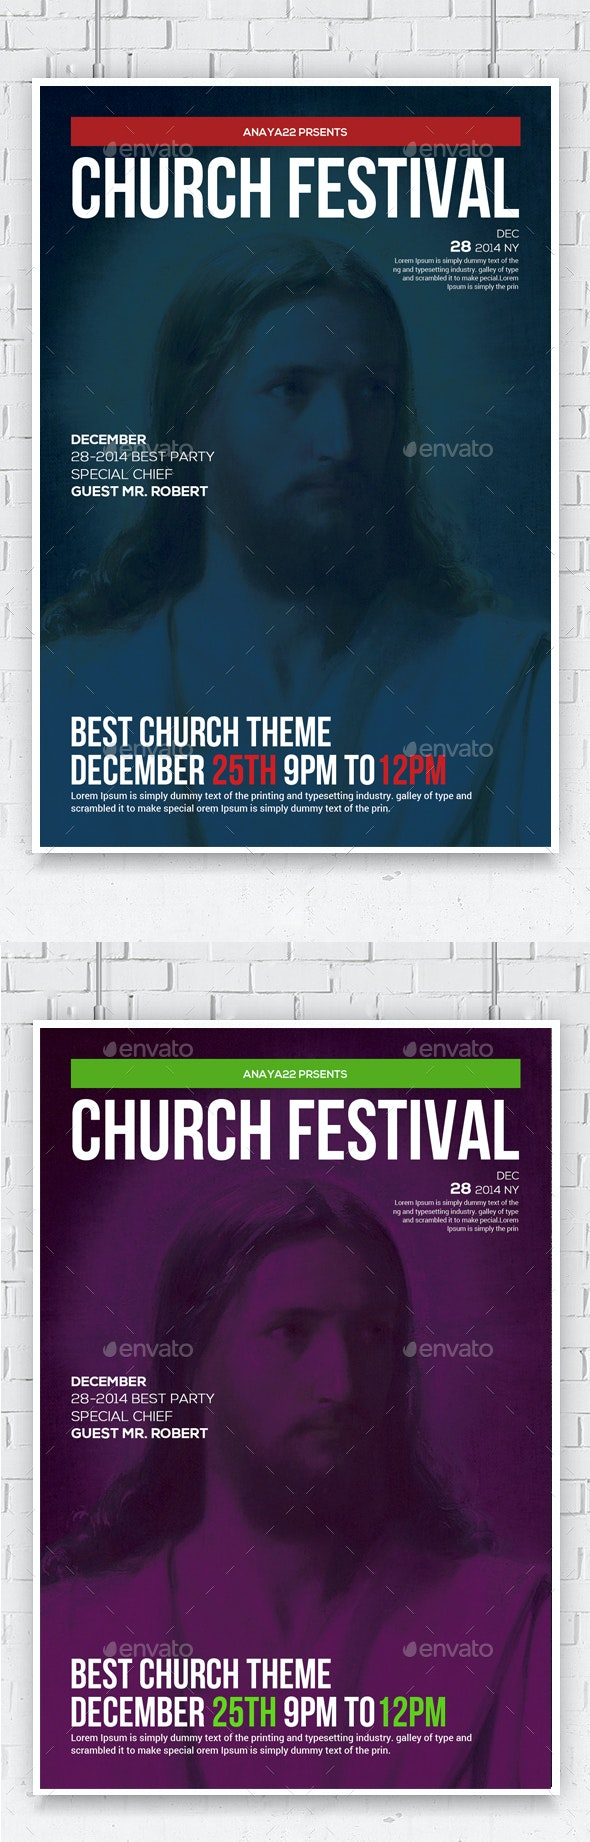 Revival Church Flyer - Church Flyers